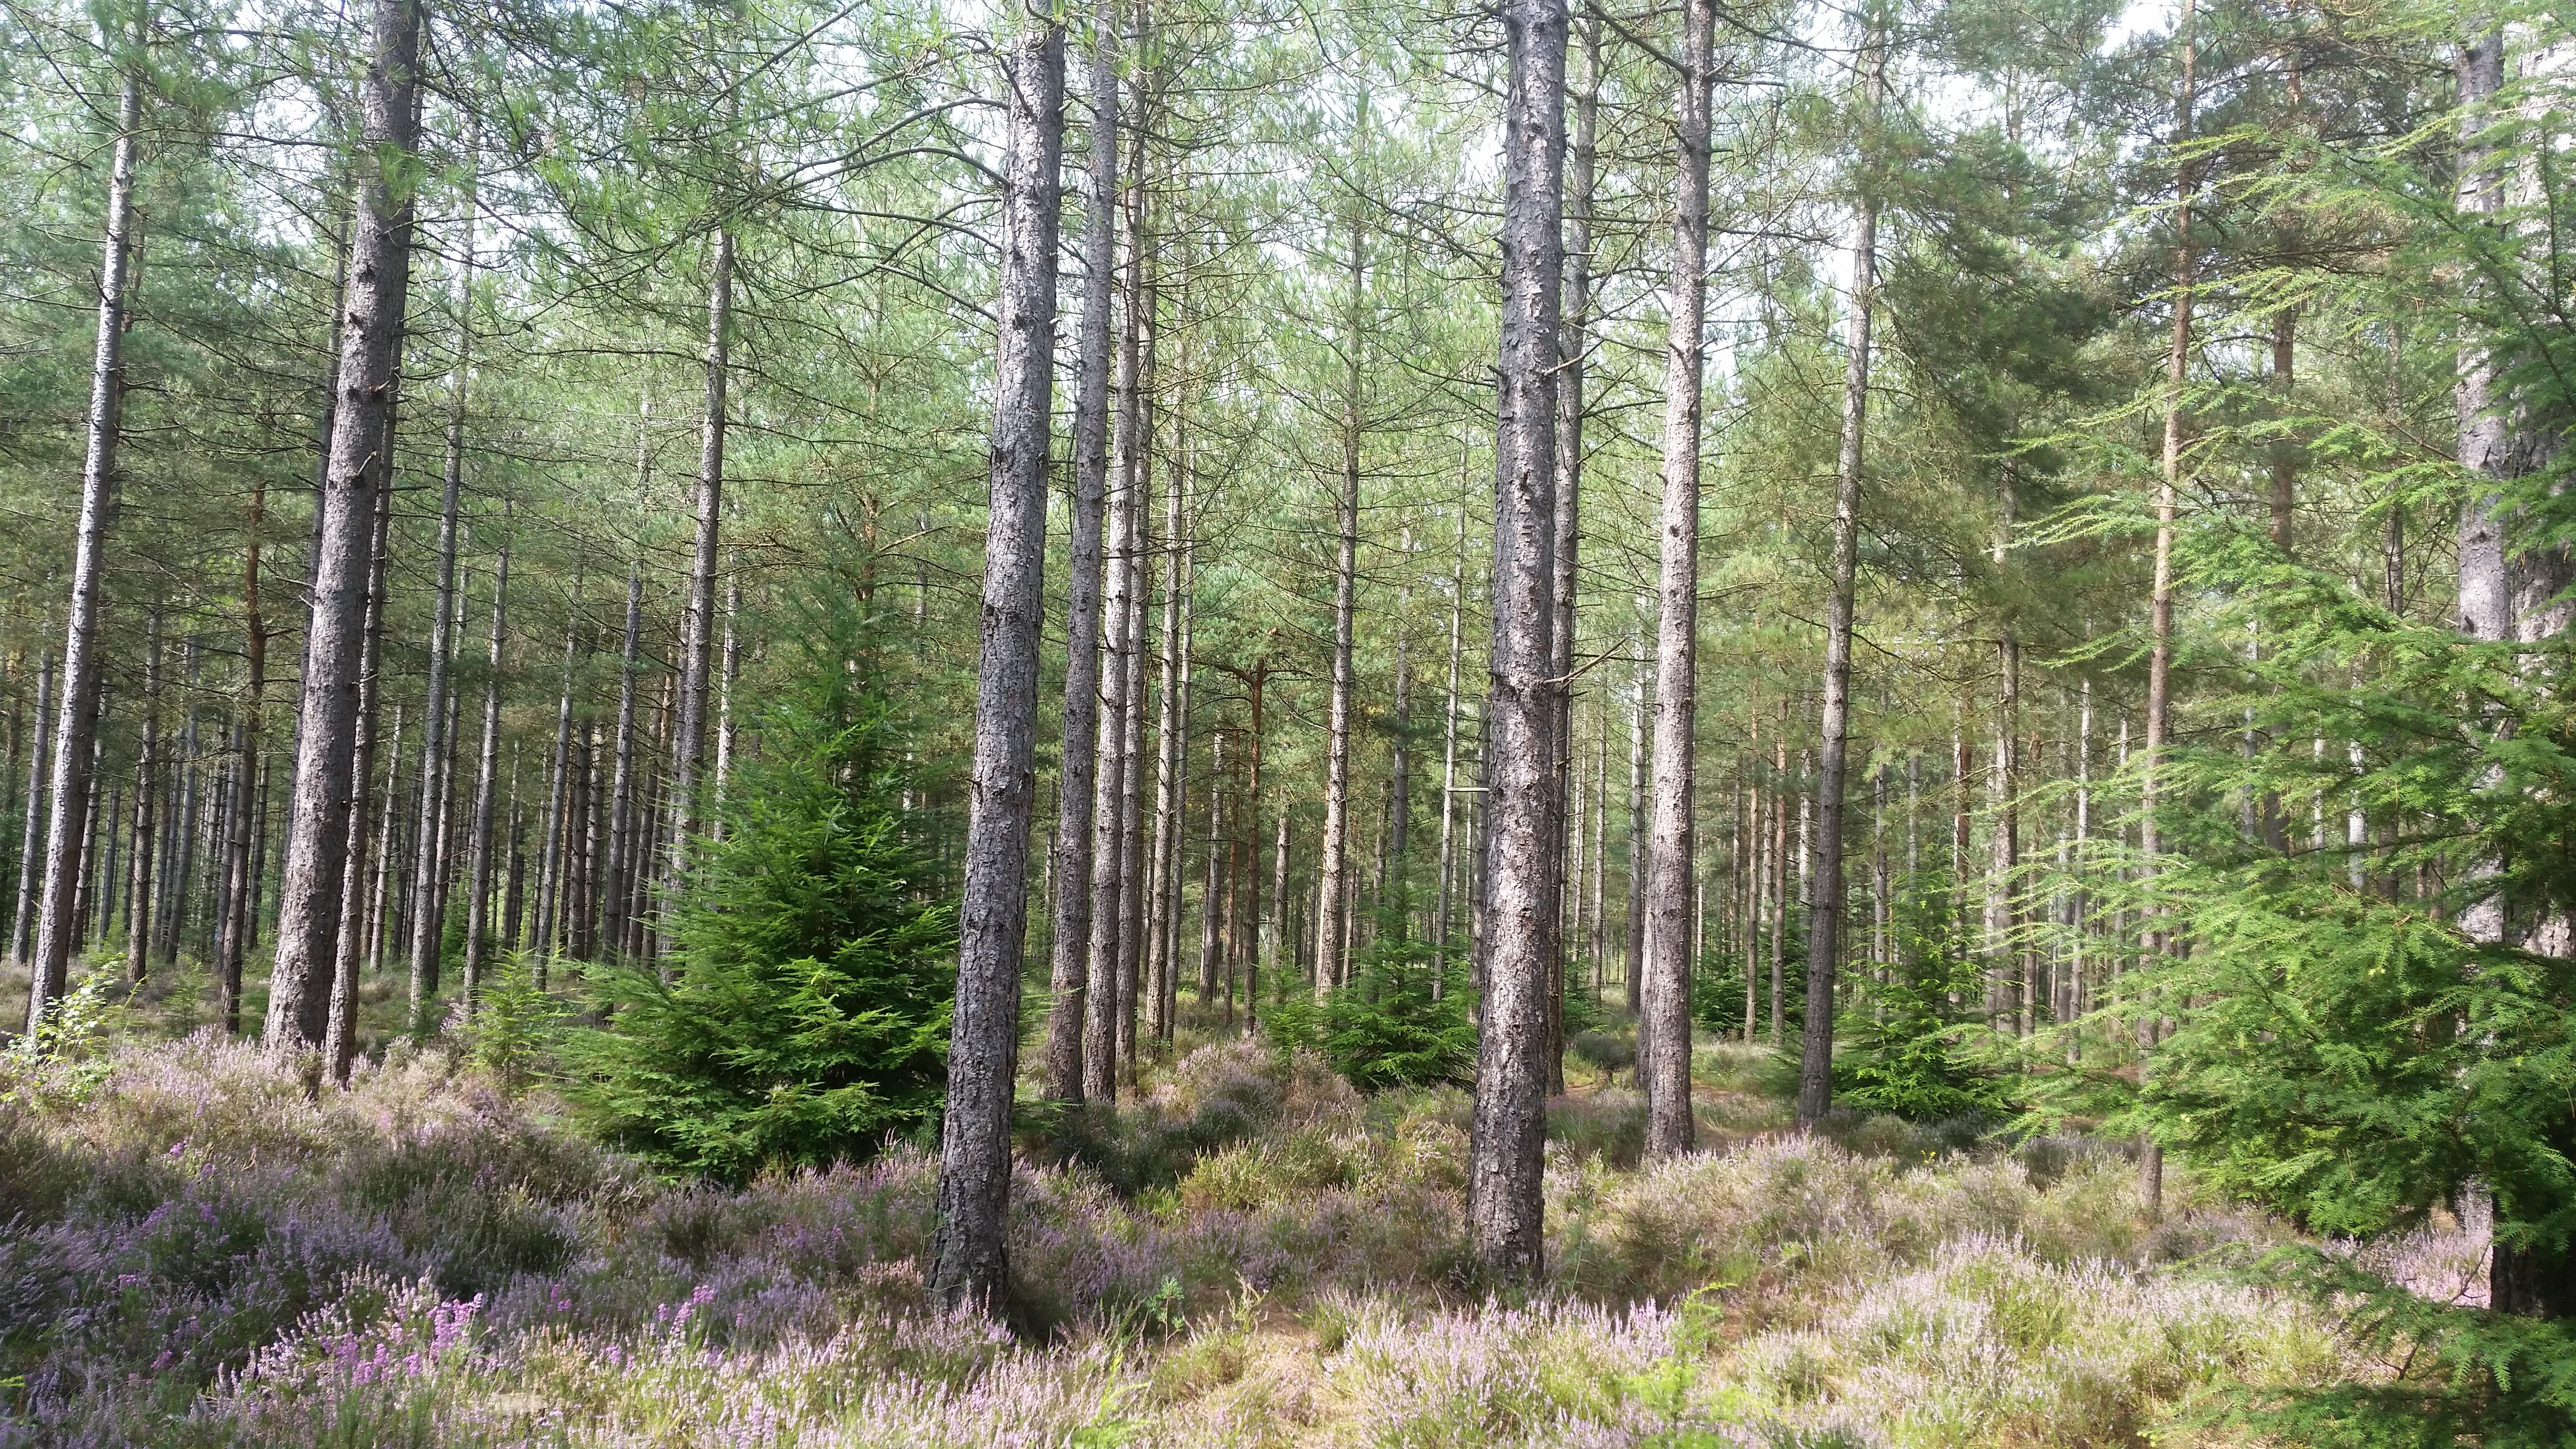 Trees, nature, zero waste week 2017